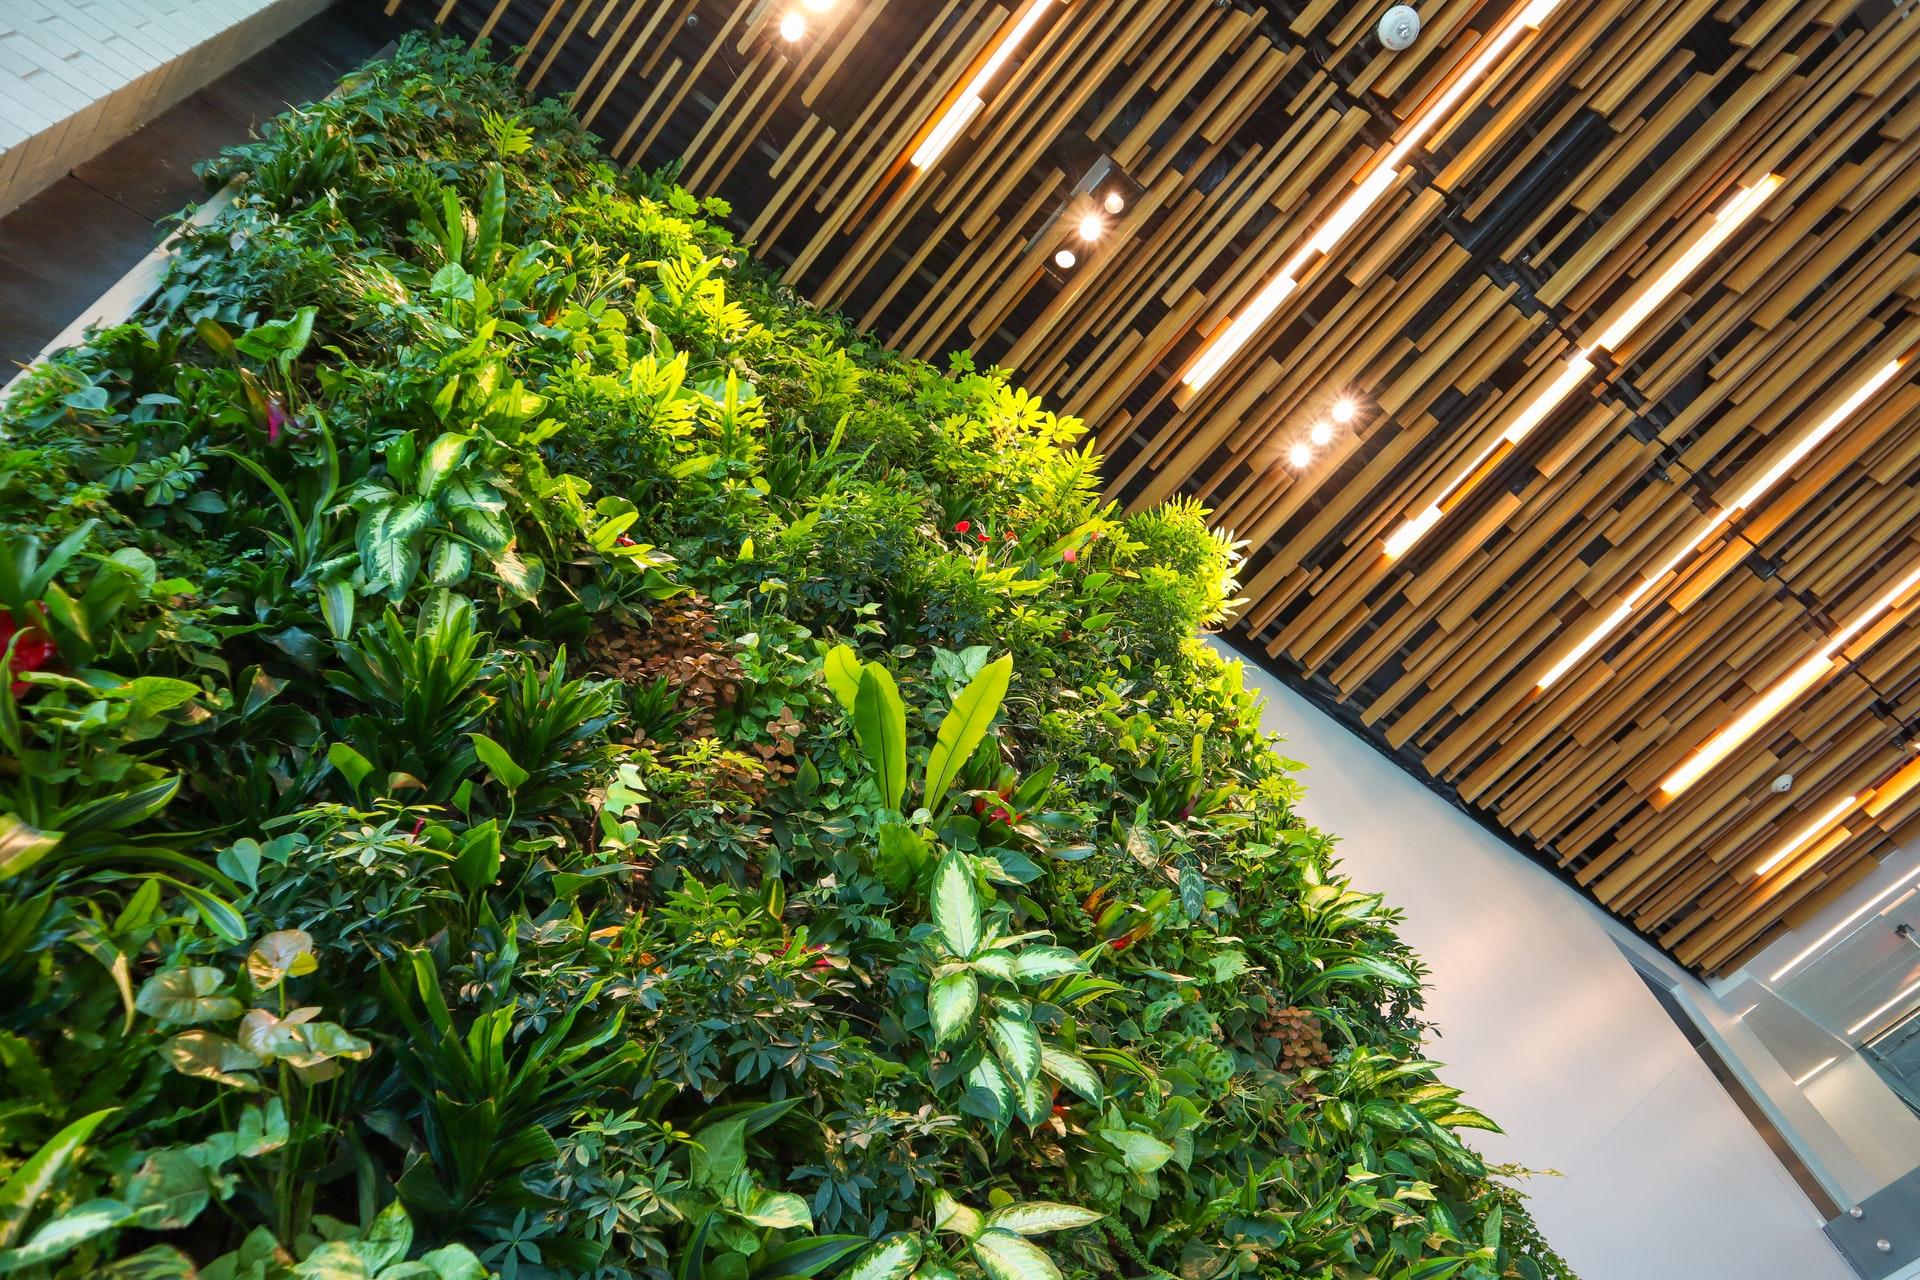 plantenwand akoestiek kantoorruimte kantoor